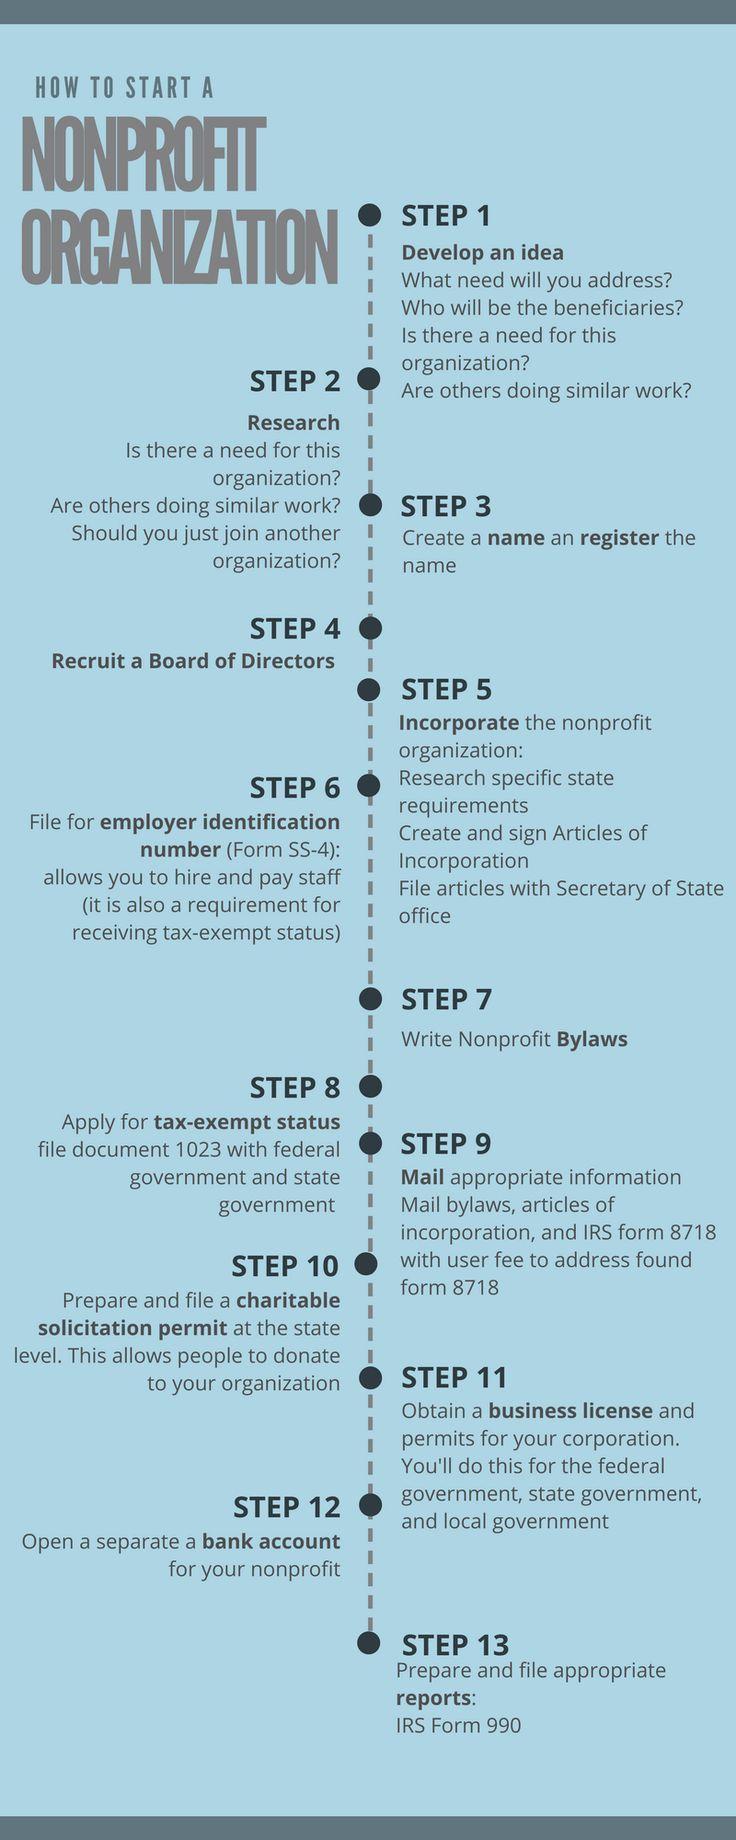 Checklist for Starting a Nonprofit Organization